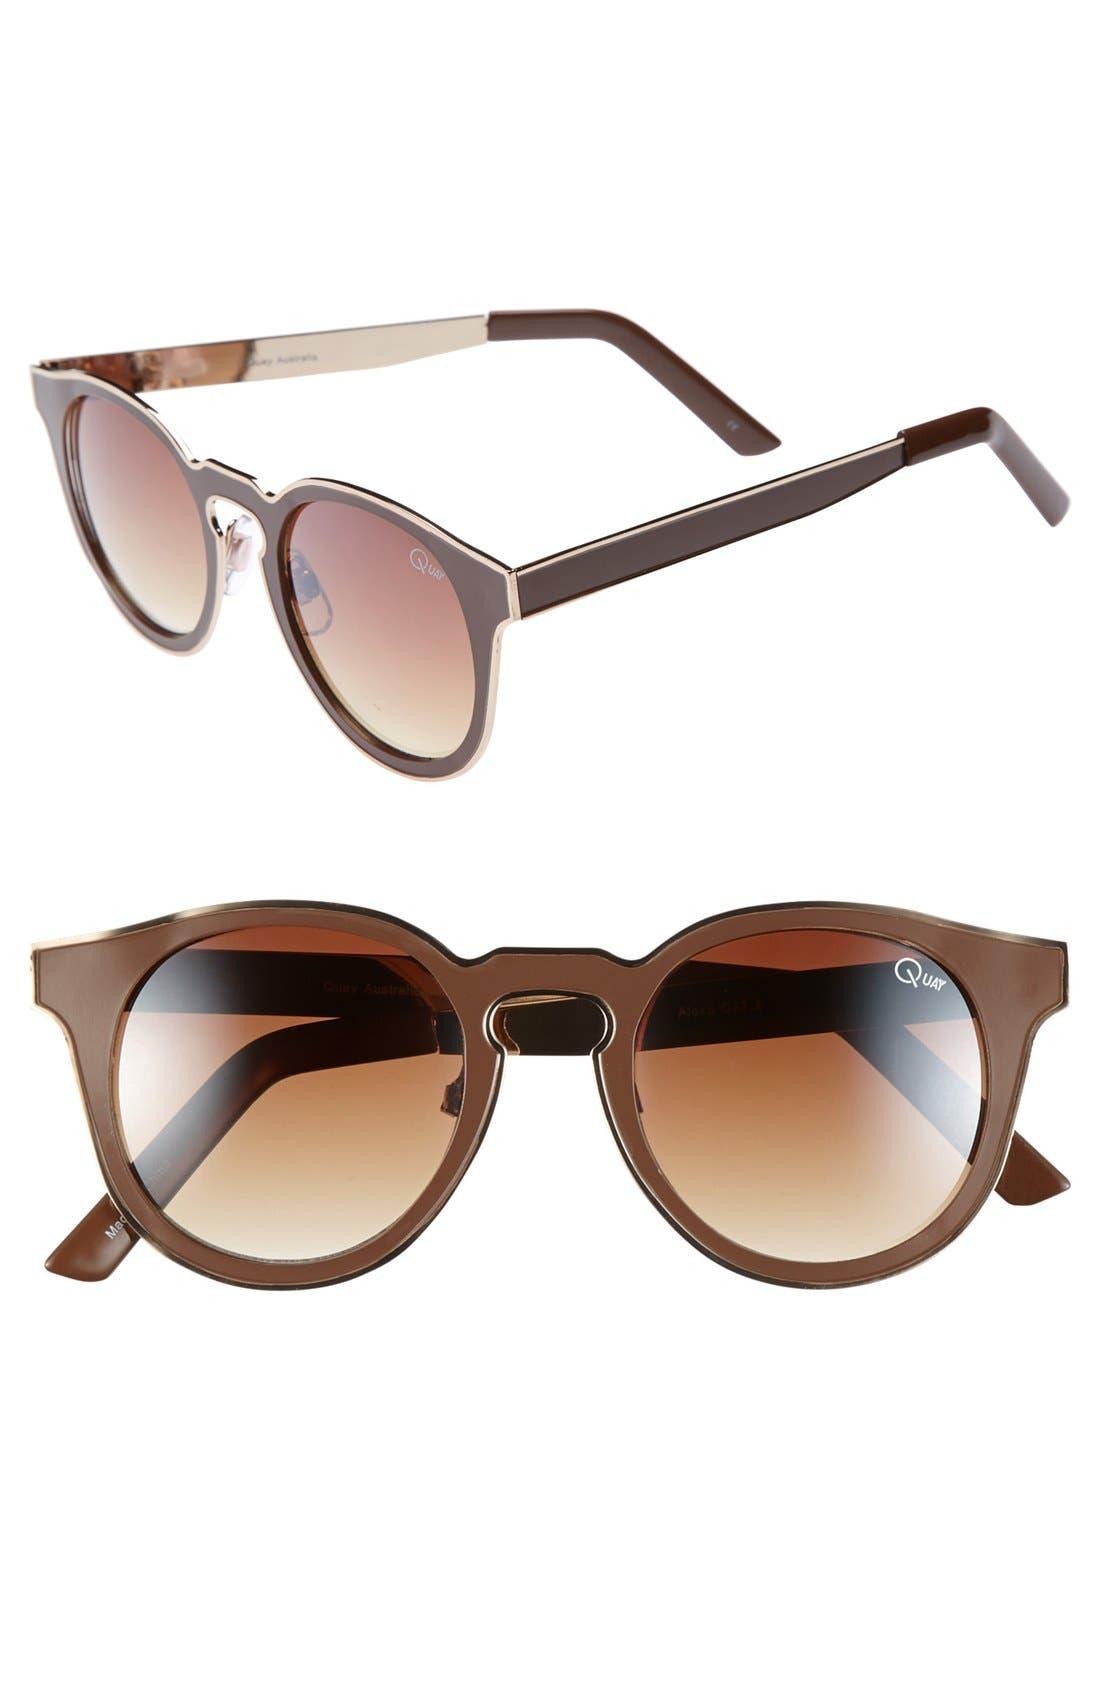 Main Image - Quay 'Alexa' 50mm Cat Eye Sunglasses